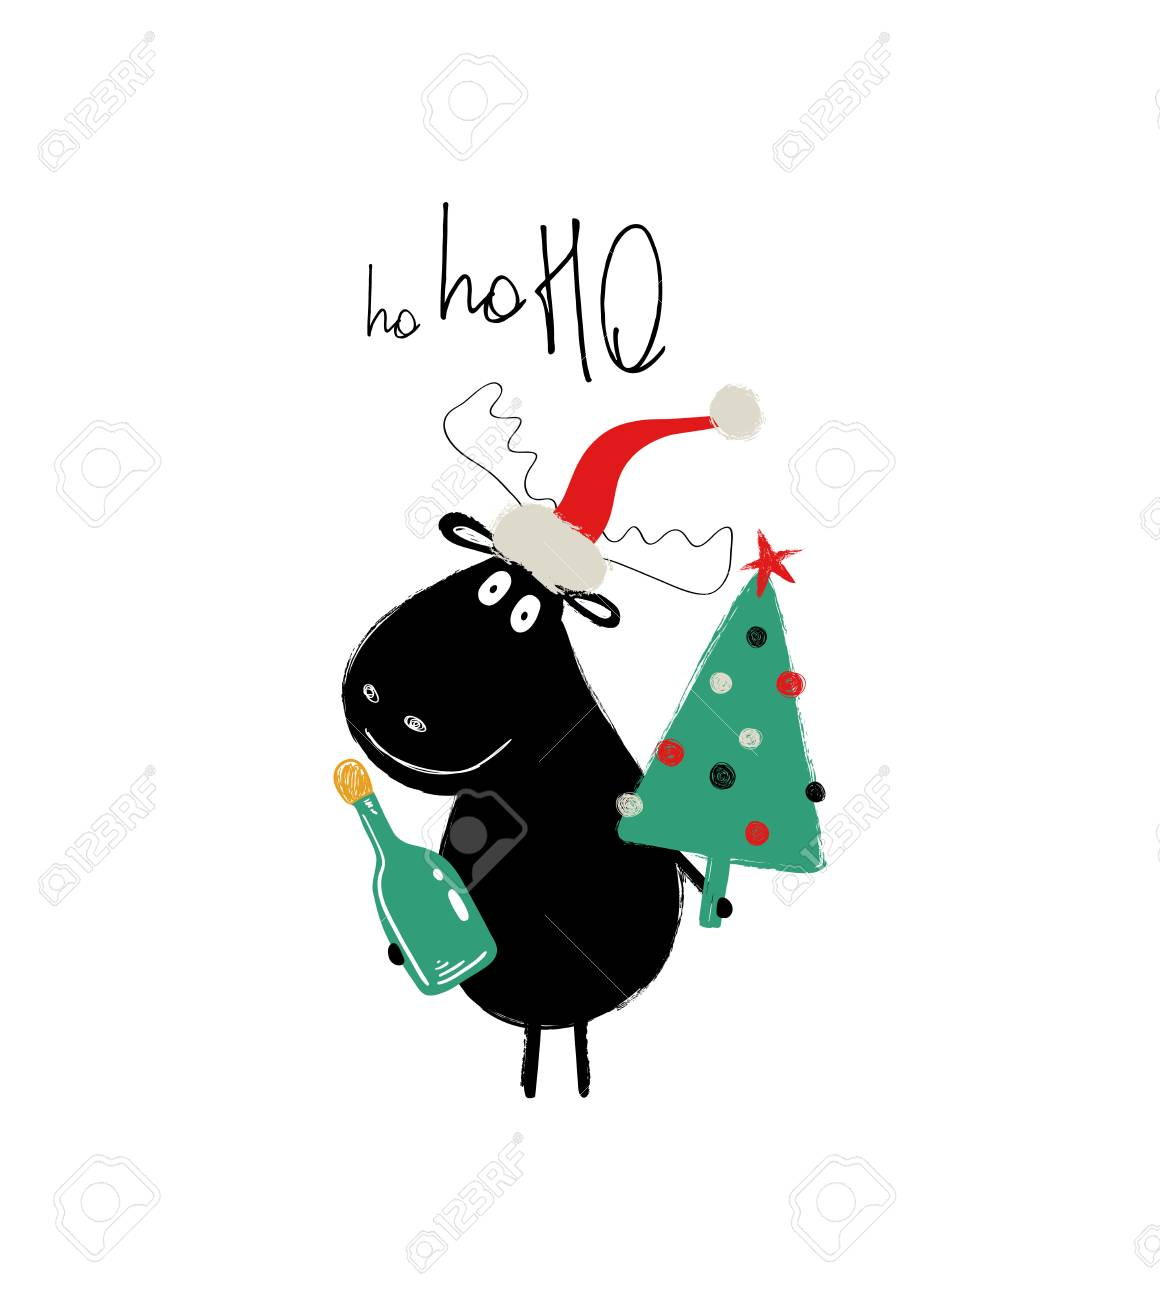 Moose in a Santa hat enclosure card